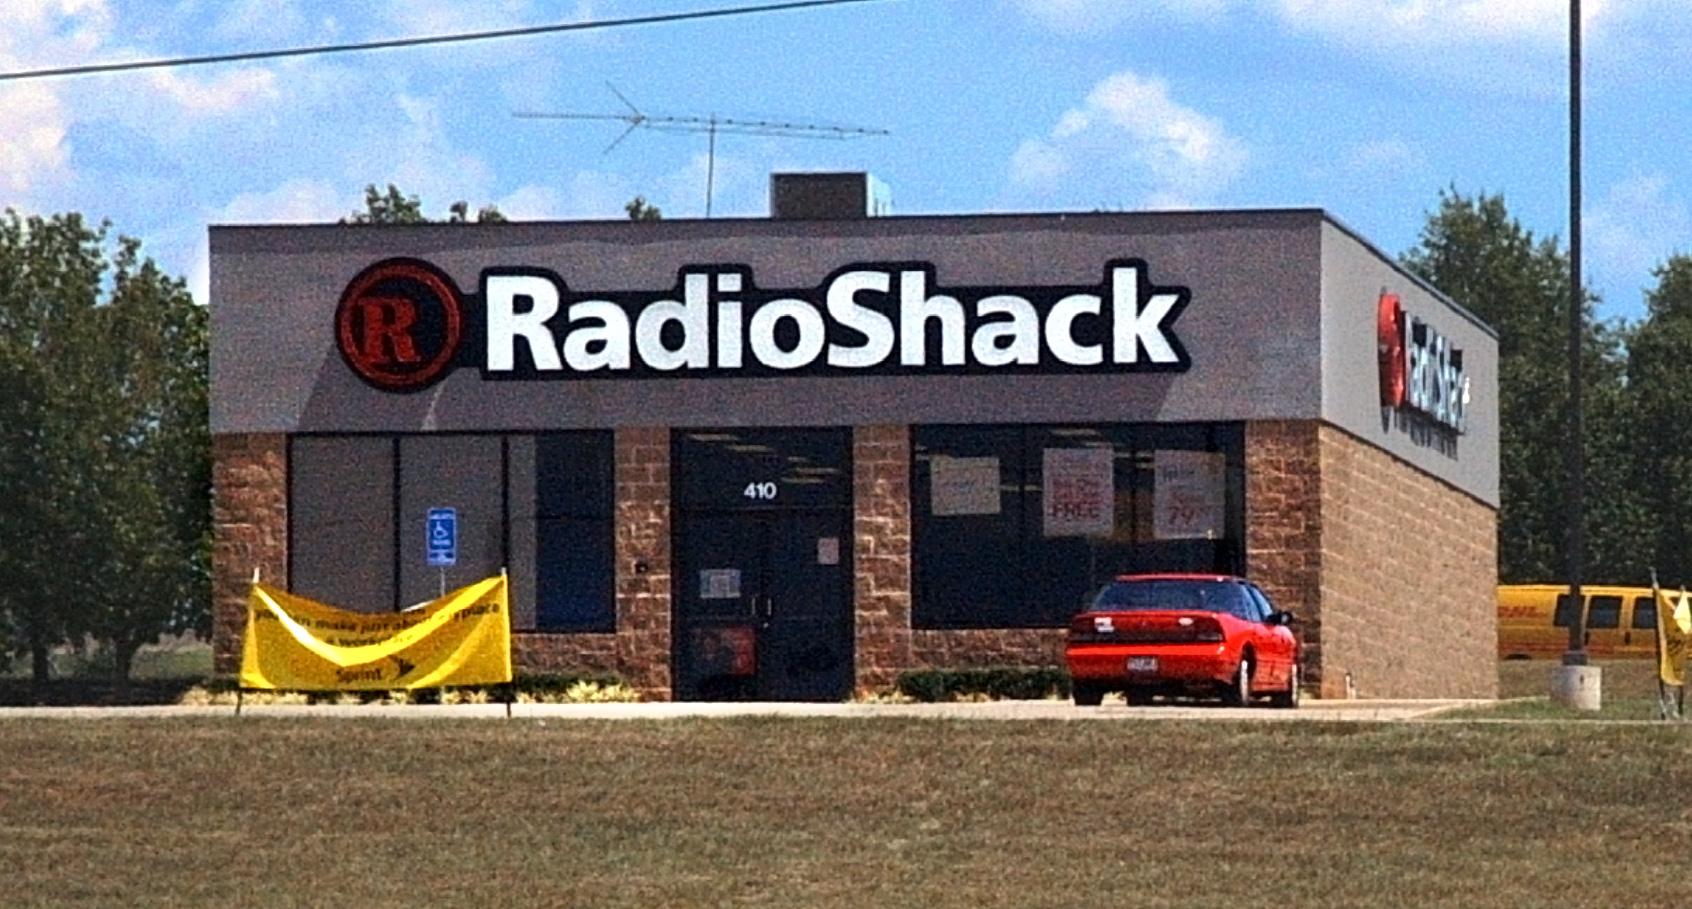 b0c6f3952af RadioShack - Wikipedia